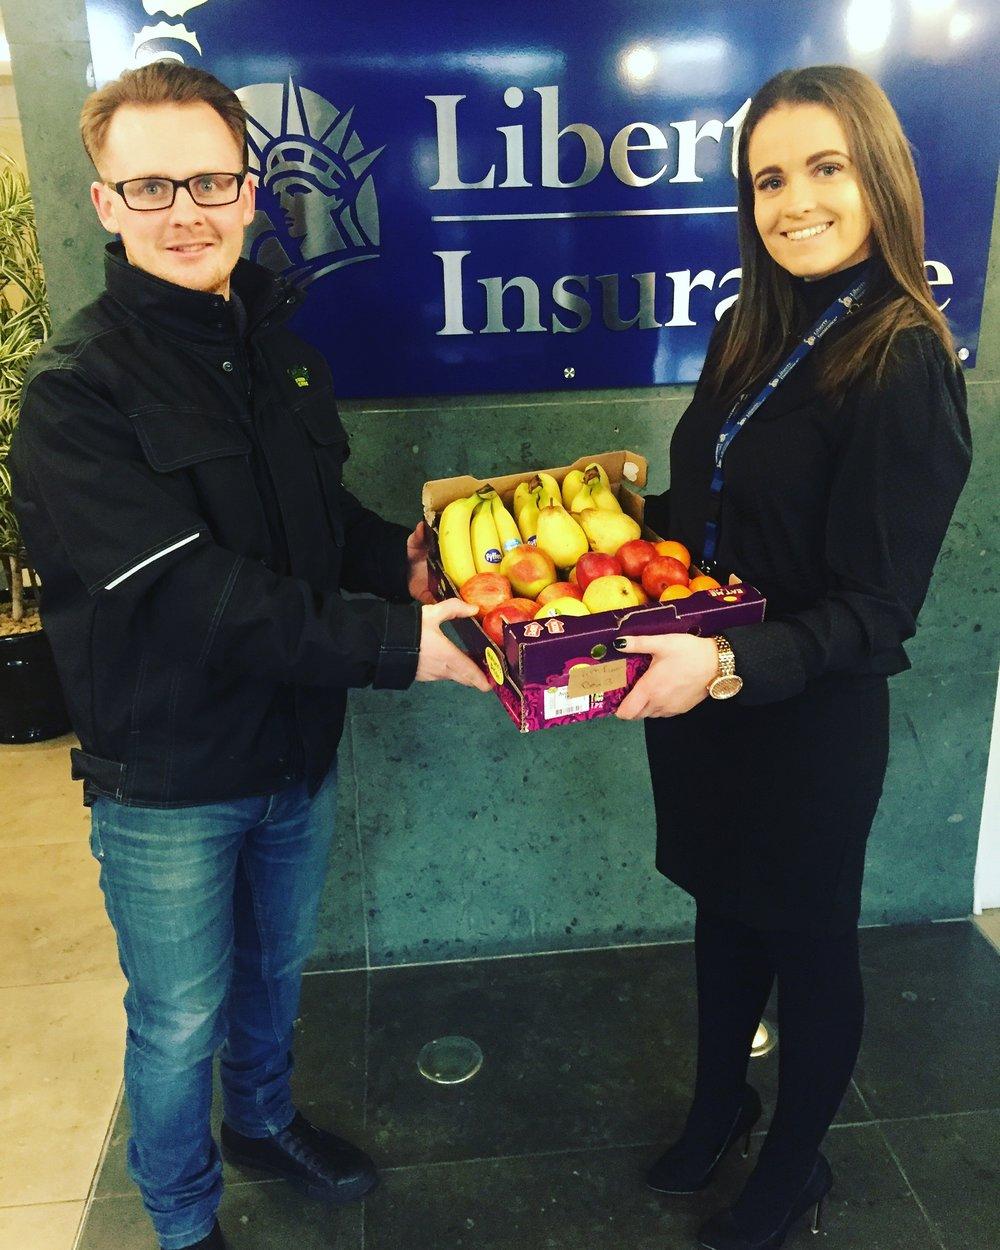 Nudie Eimear Hogan Liberty Insurance.JPG